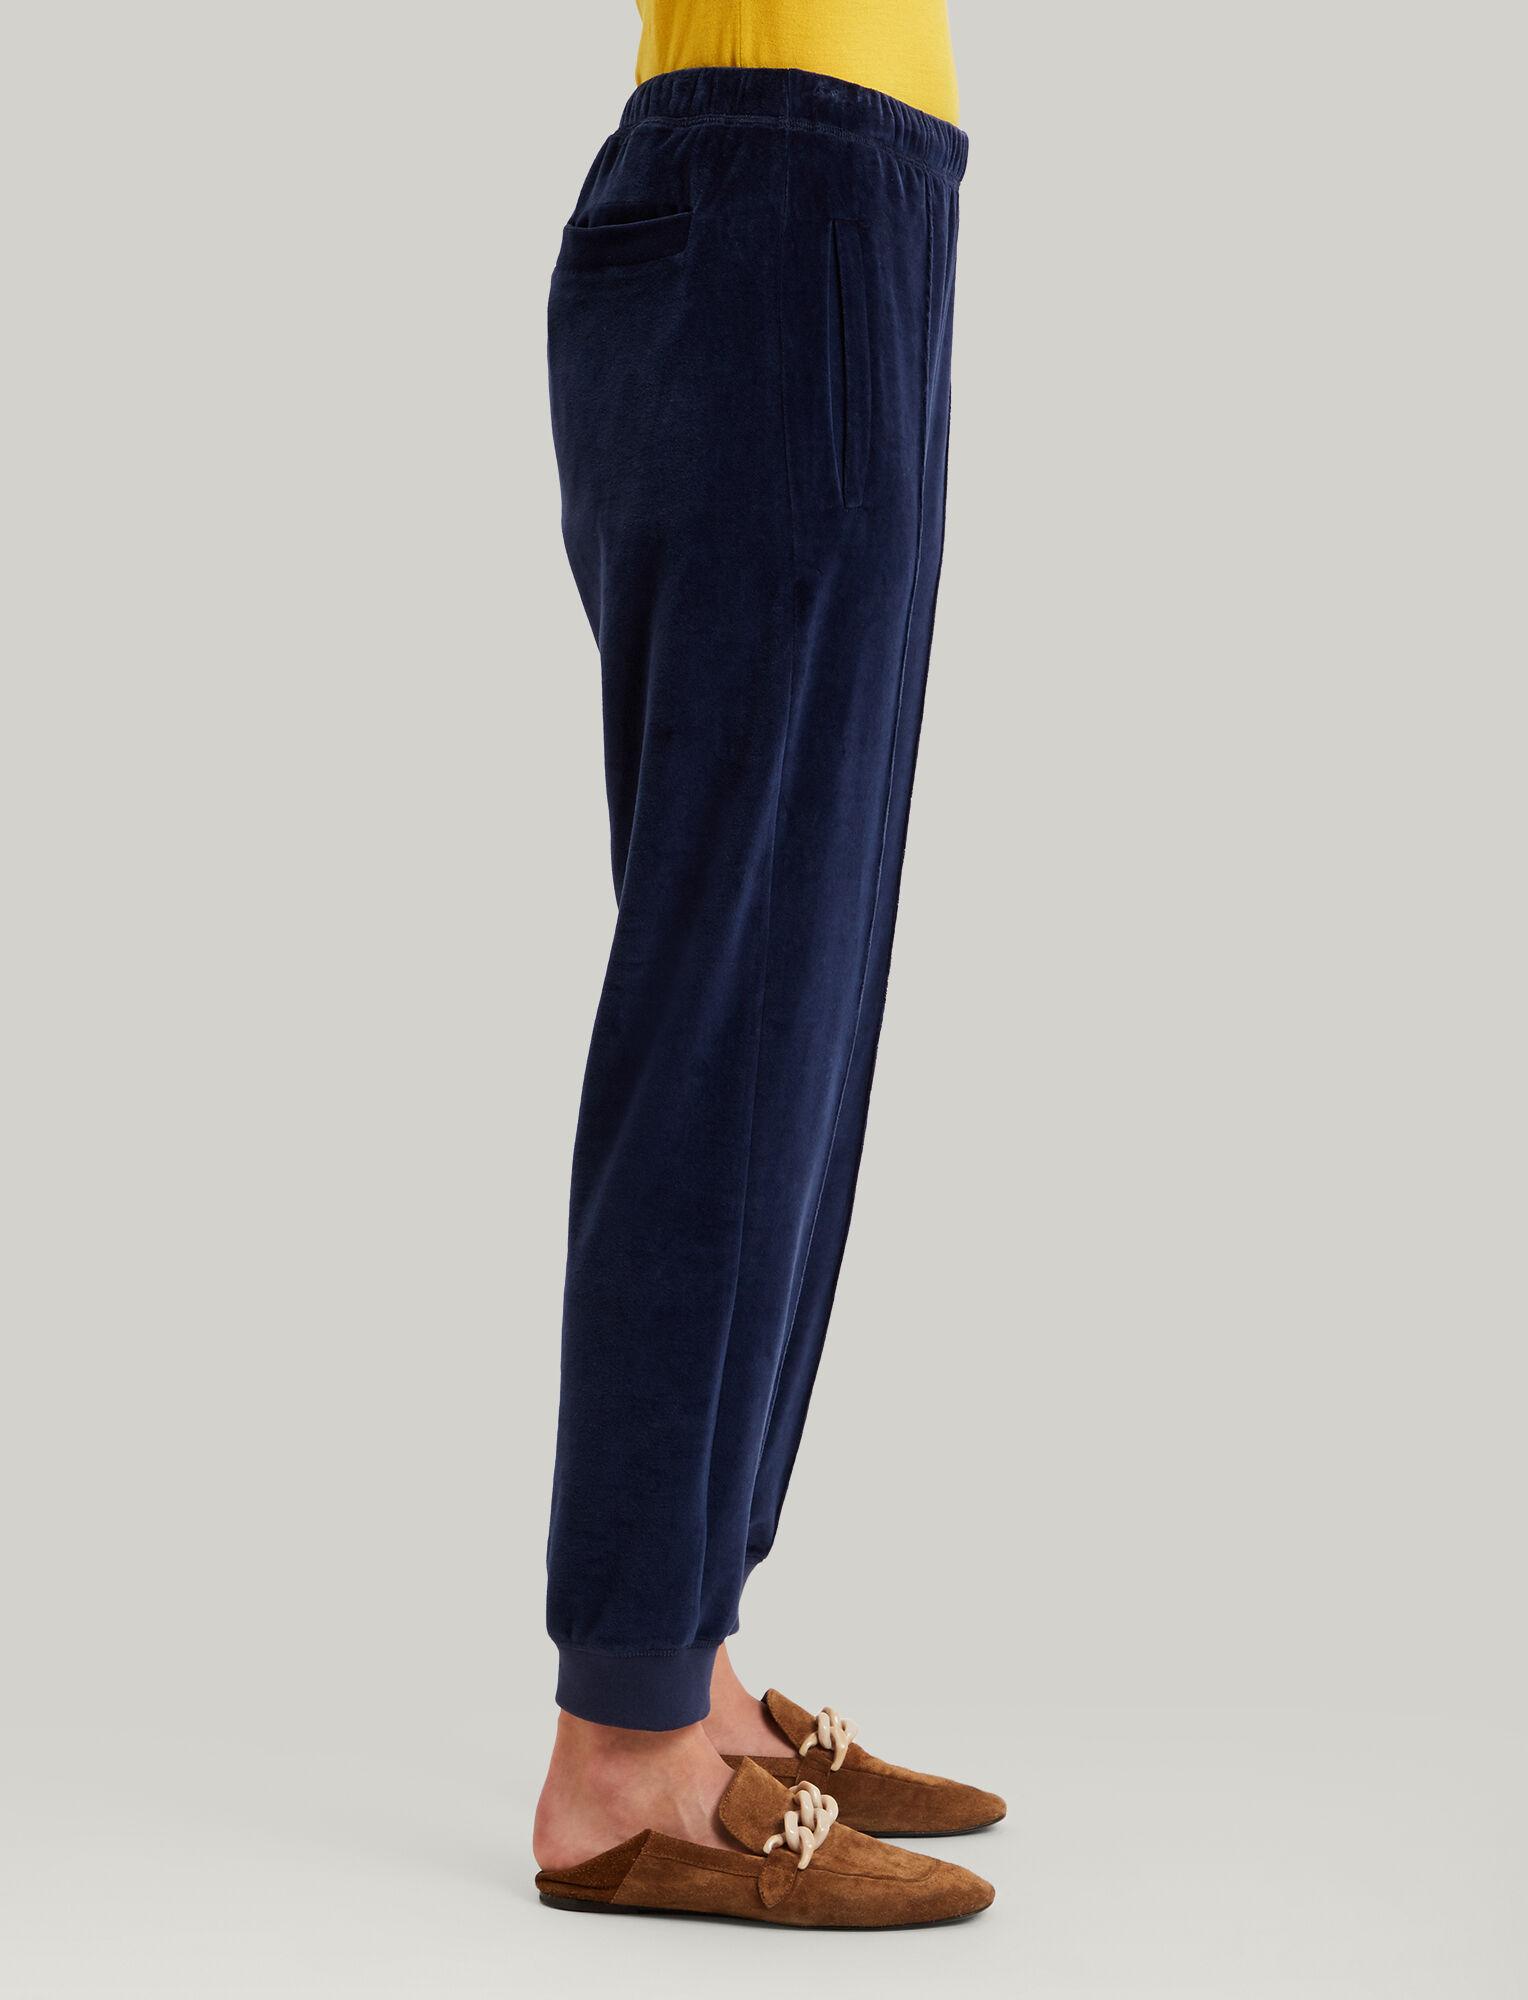 Joseph, Jog Jersey Velours Trousers, in NAVY